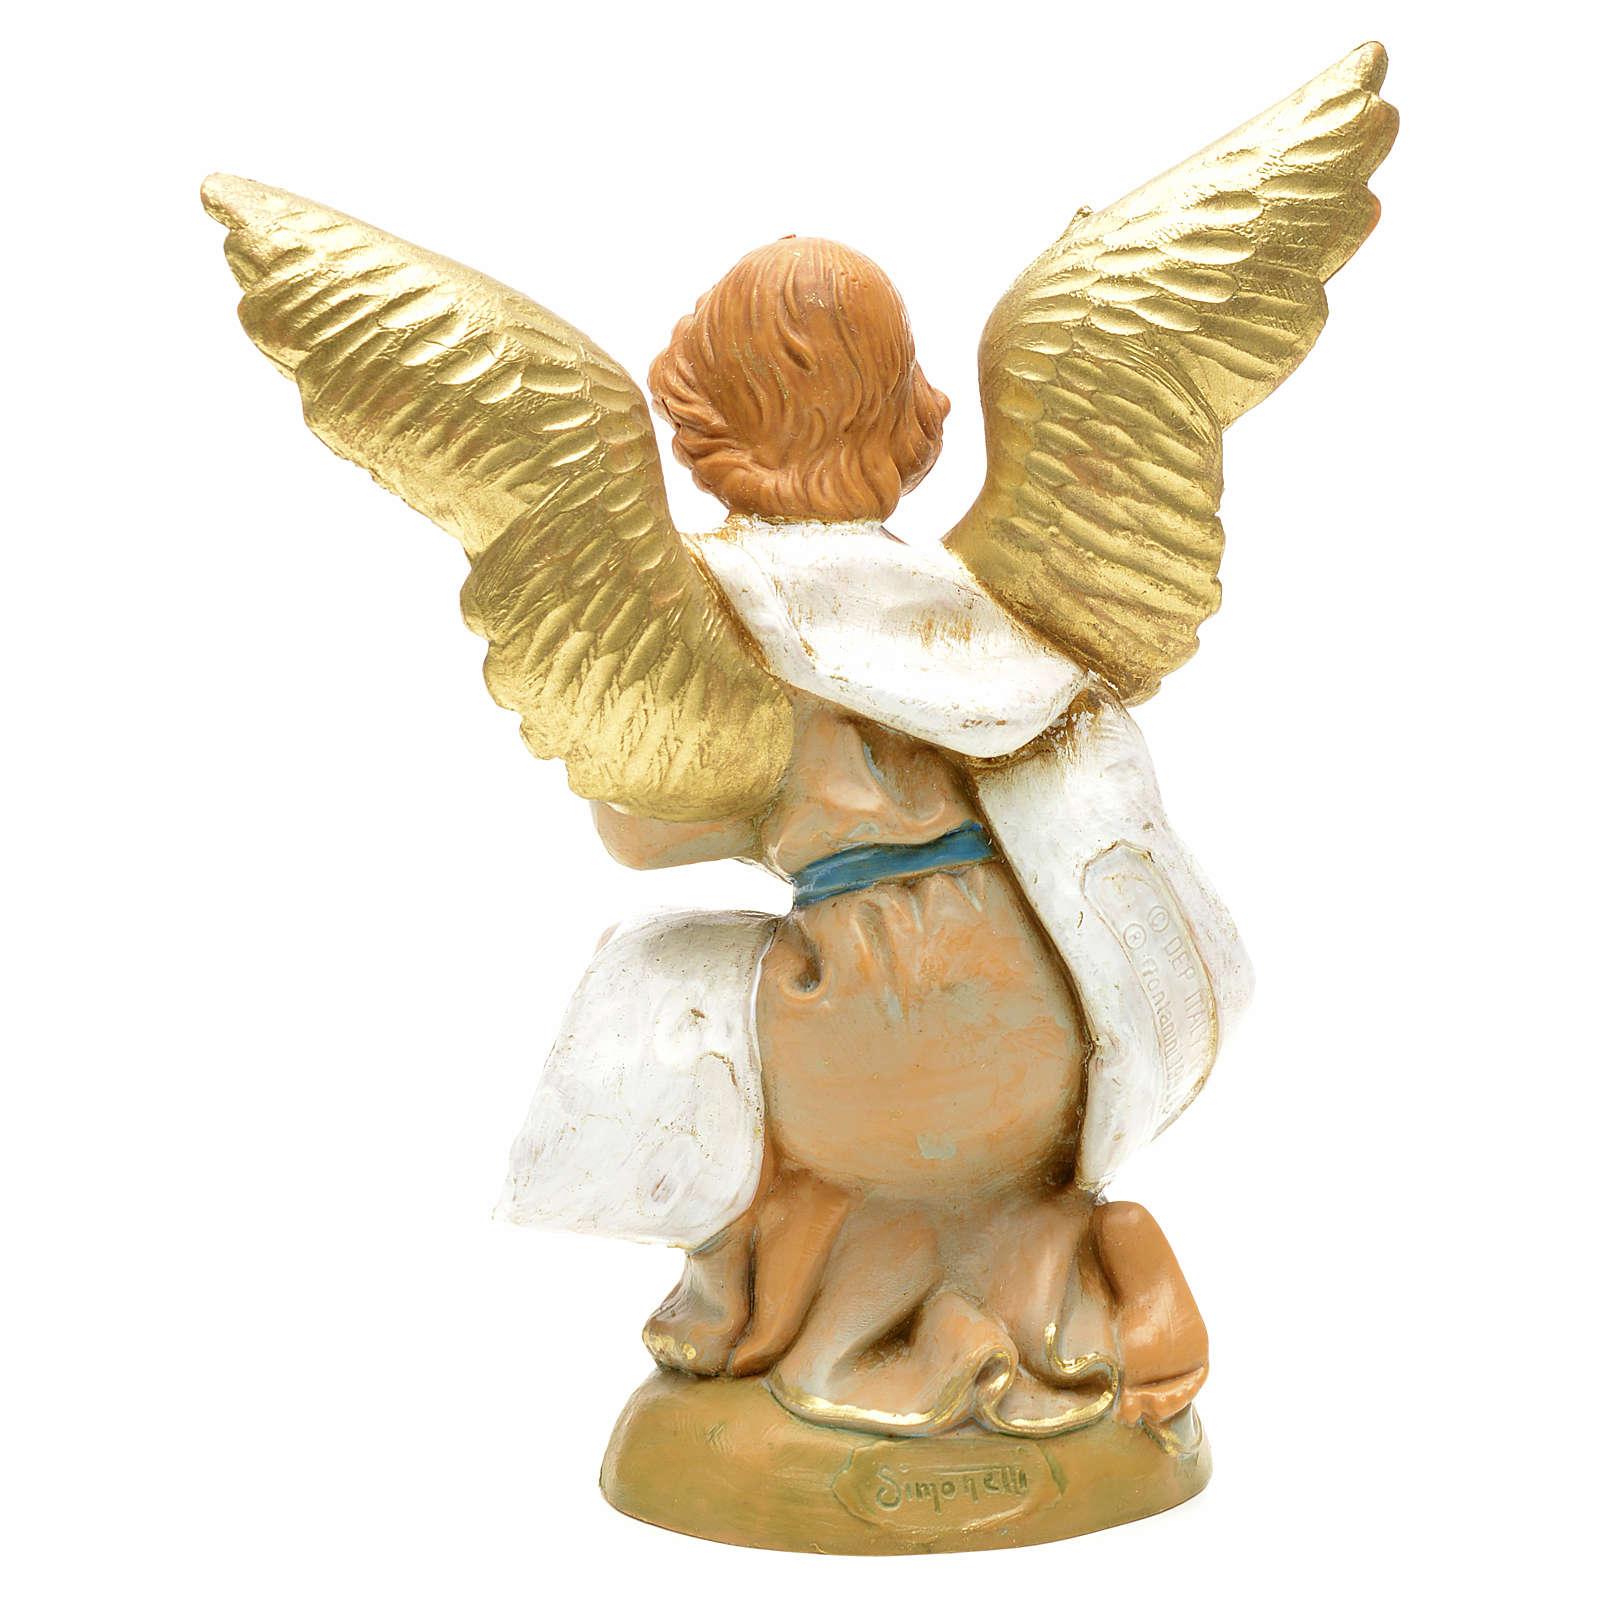 Krippenfigur Engel auf den Knien Fontanini 12 cm 3